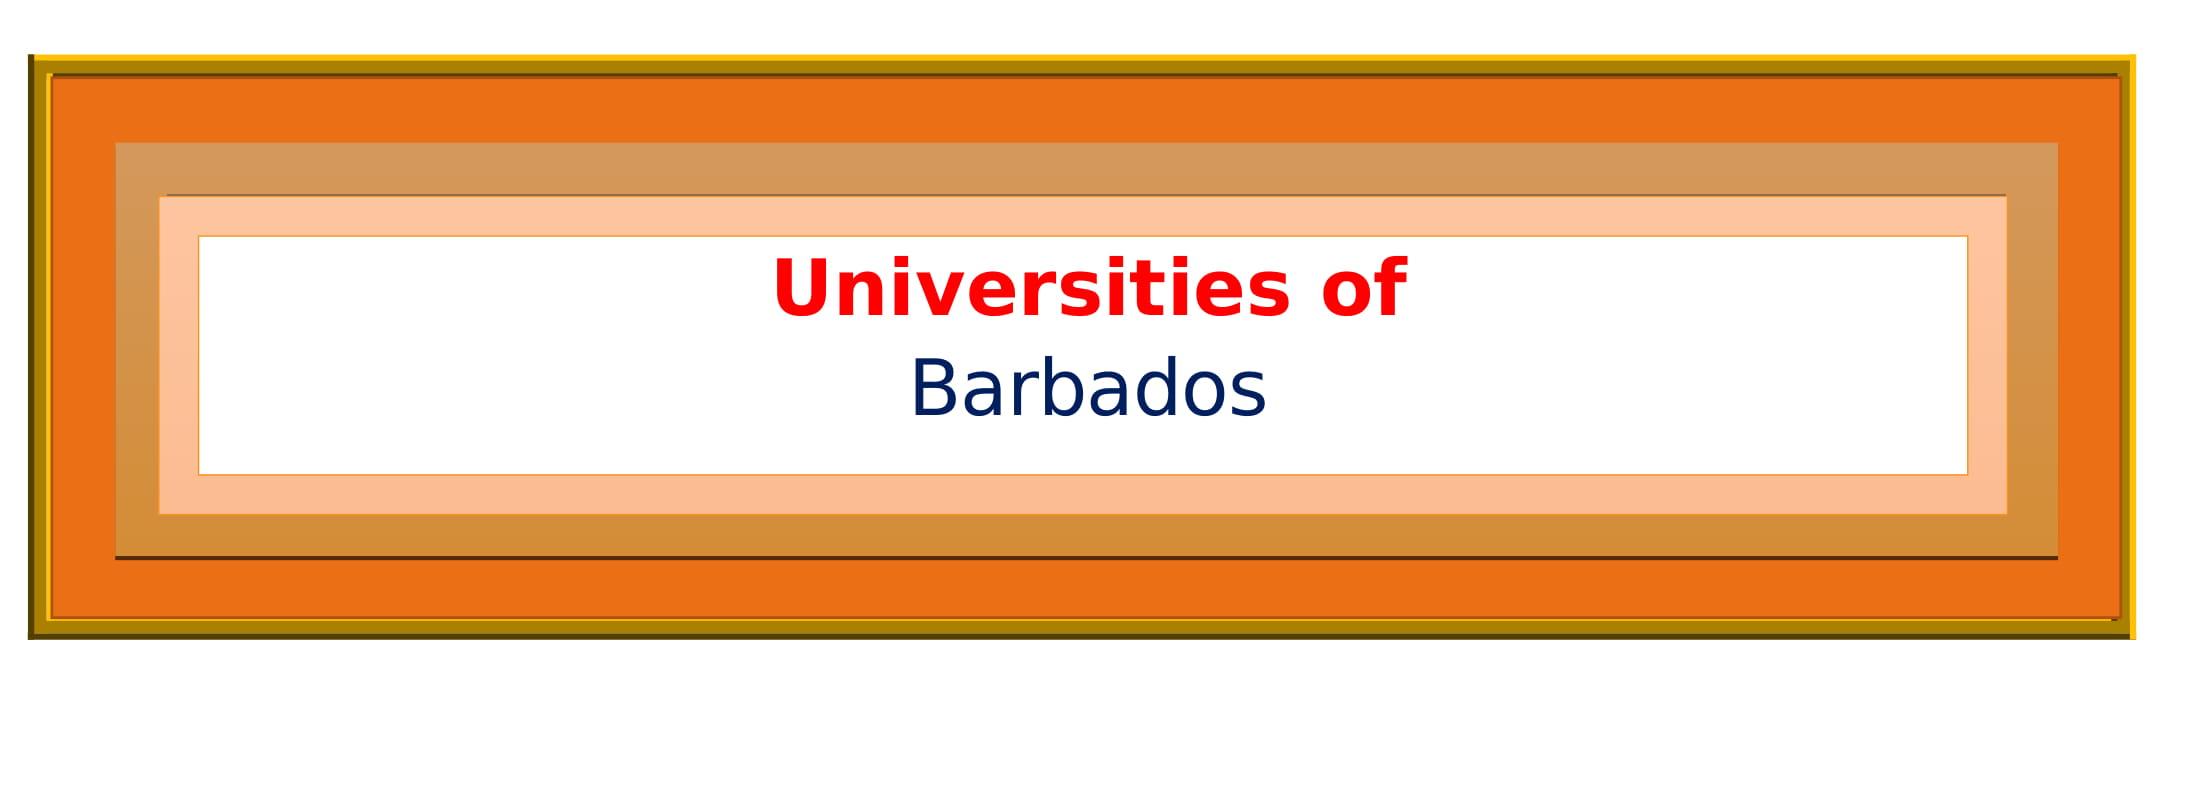 List of Universities in Barbados